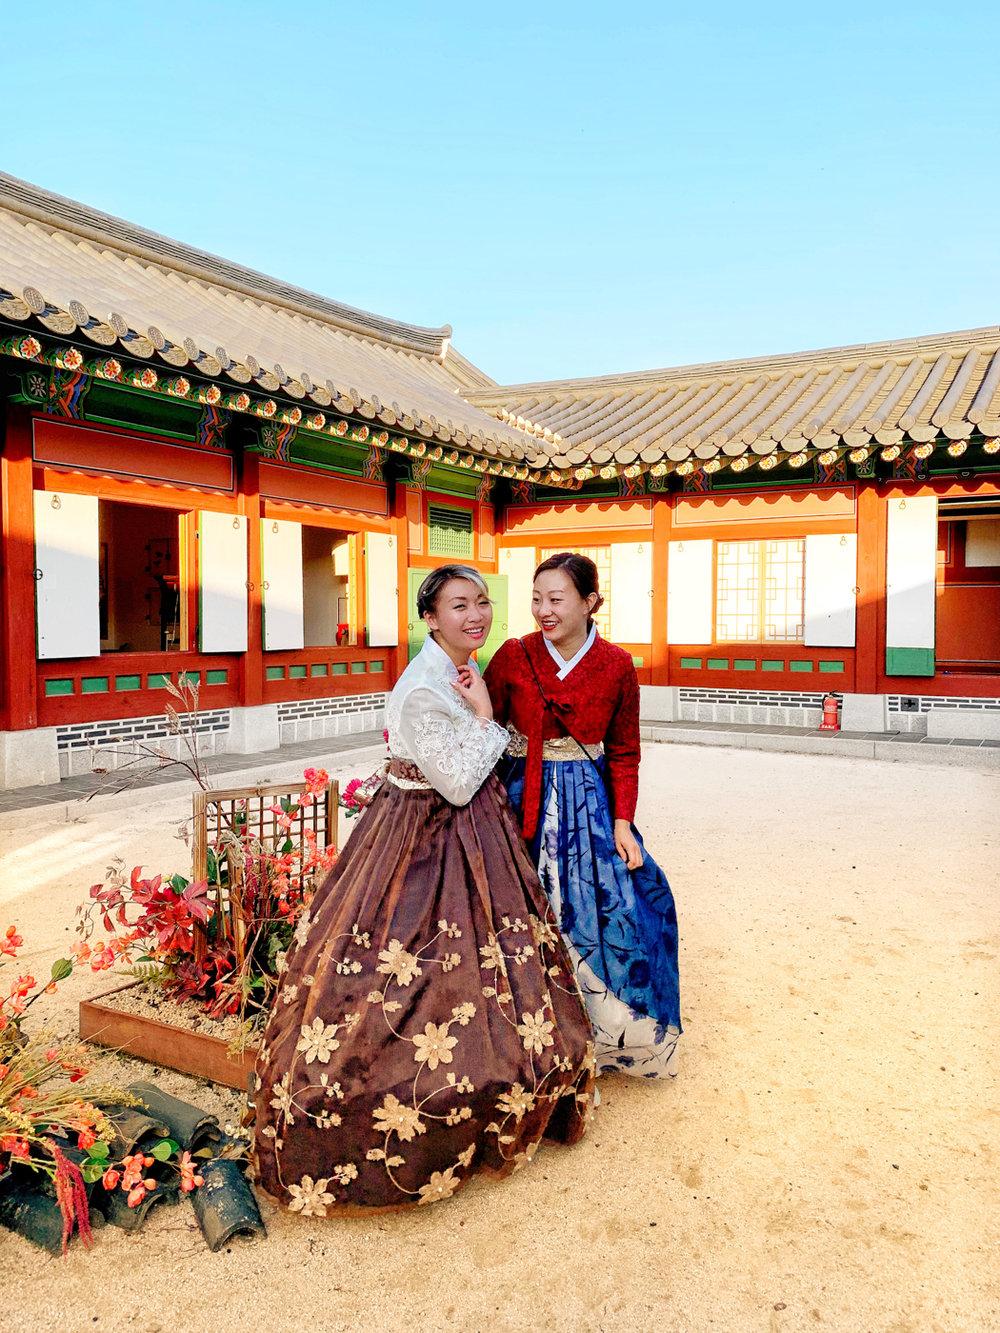 Hanbok Rental Gyeongbokgung | Seoul, Korea Travel Guide | The Chic Diary